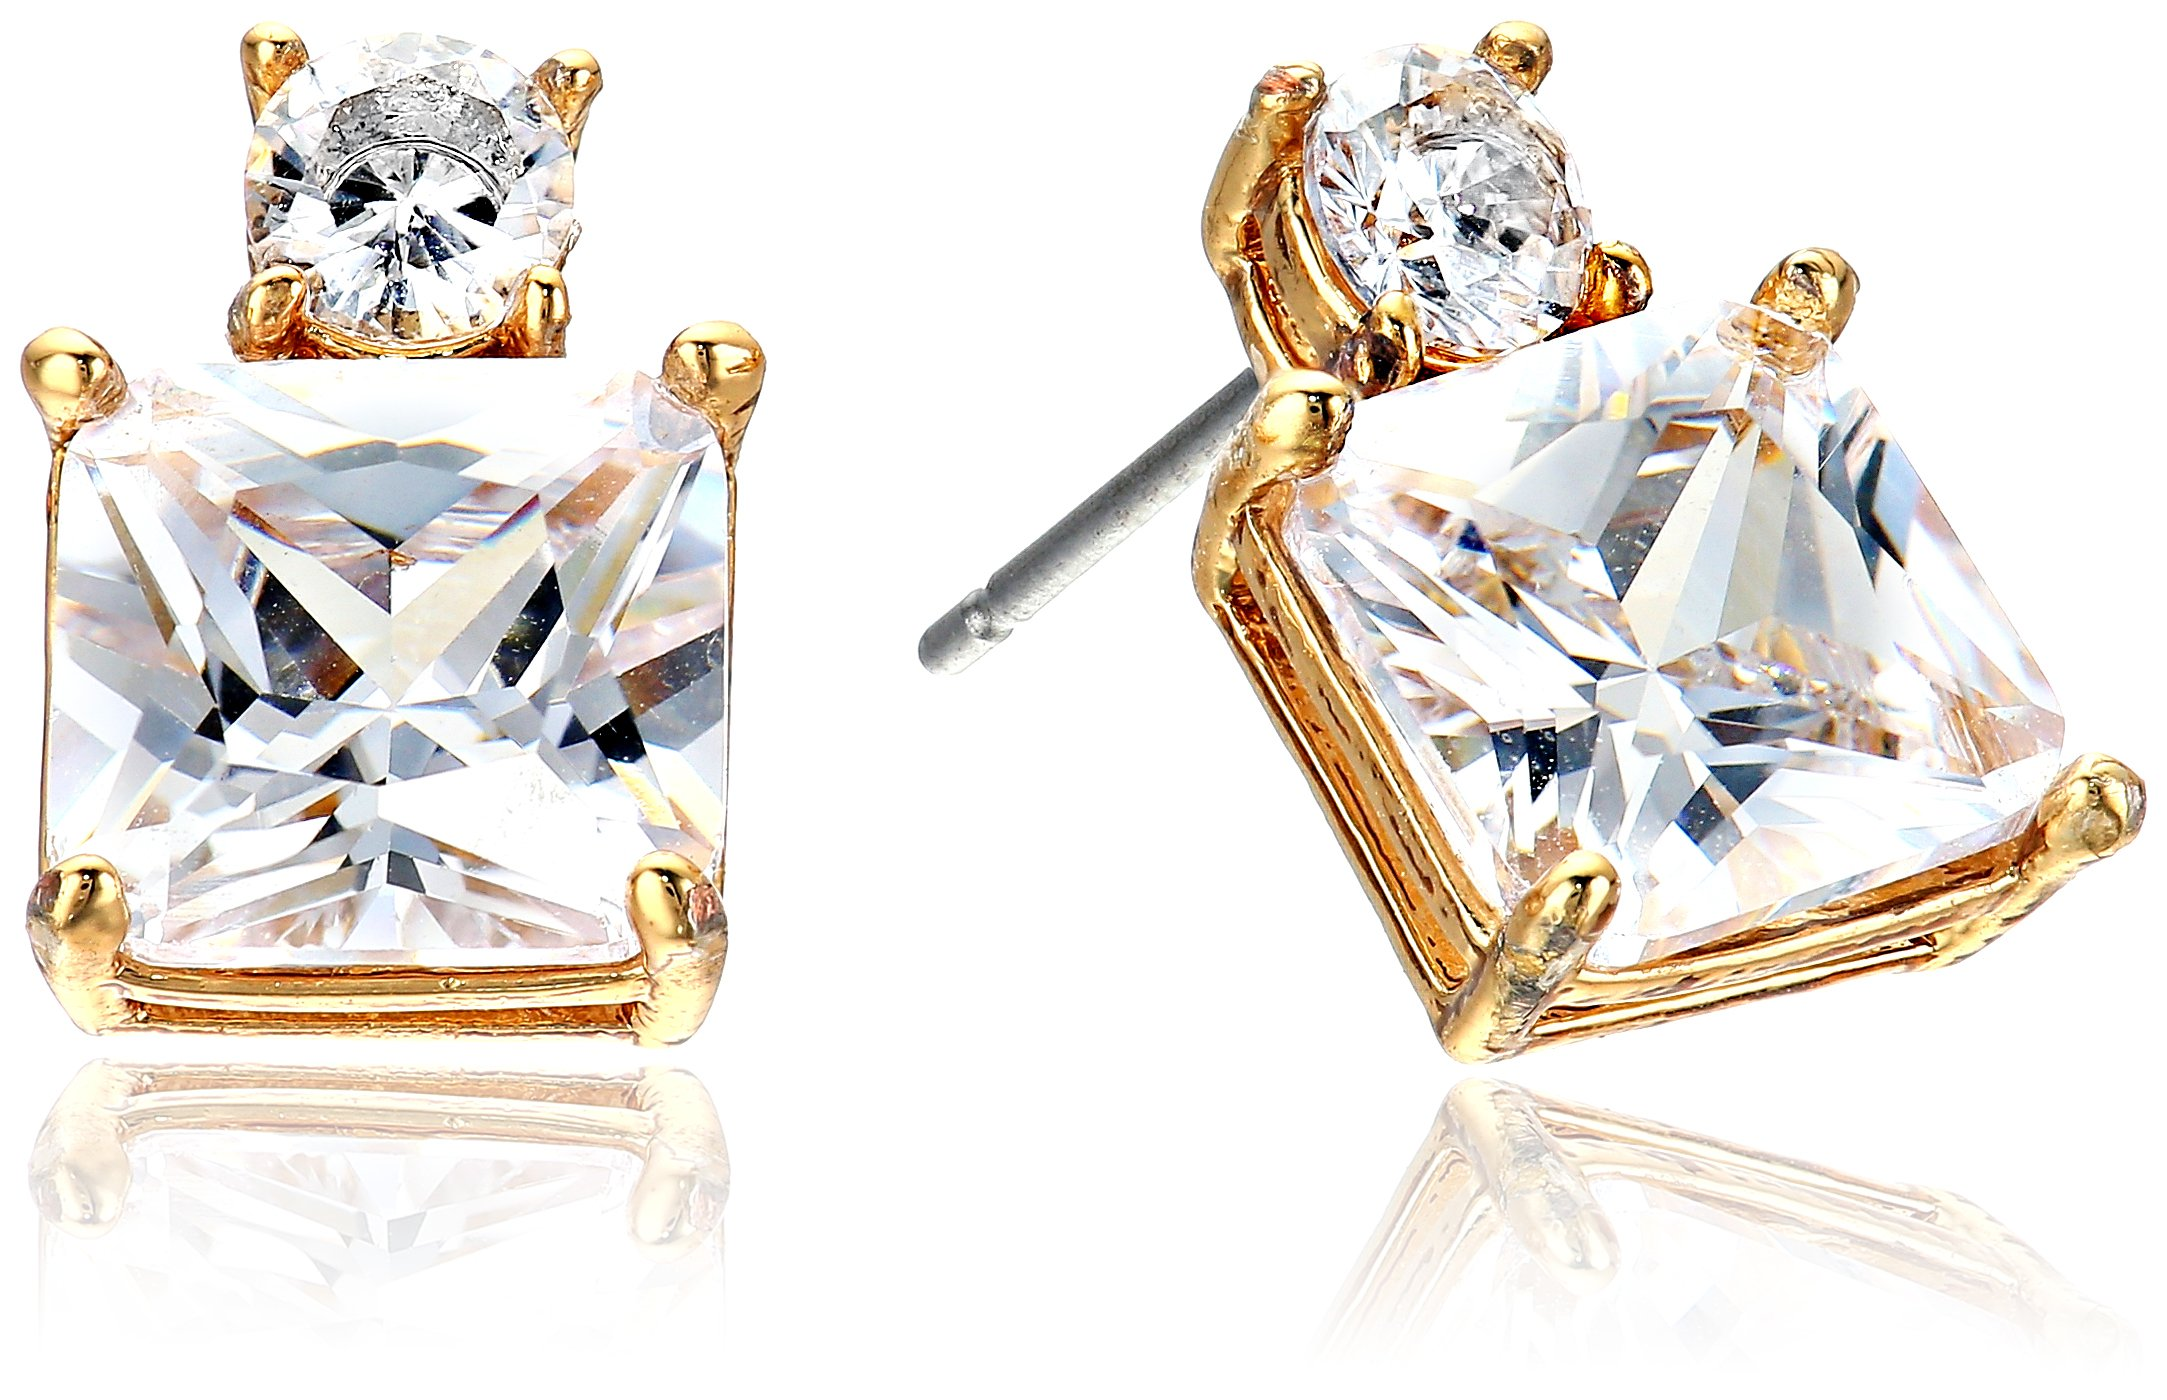 kate spade new york''Delicate Drop Earrings'' Flying Colors Delicate Clear/Gold Drop Earrings